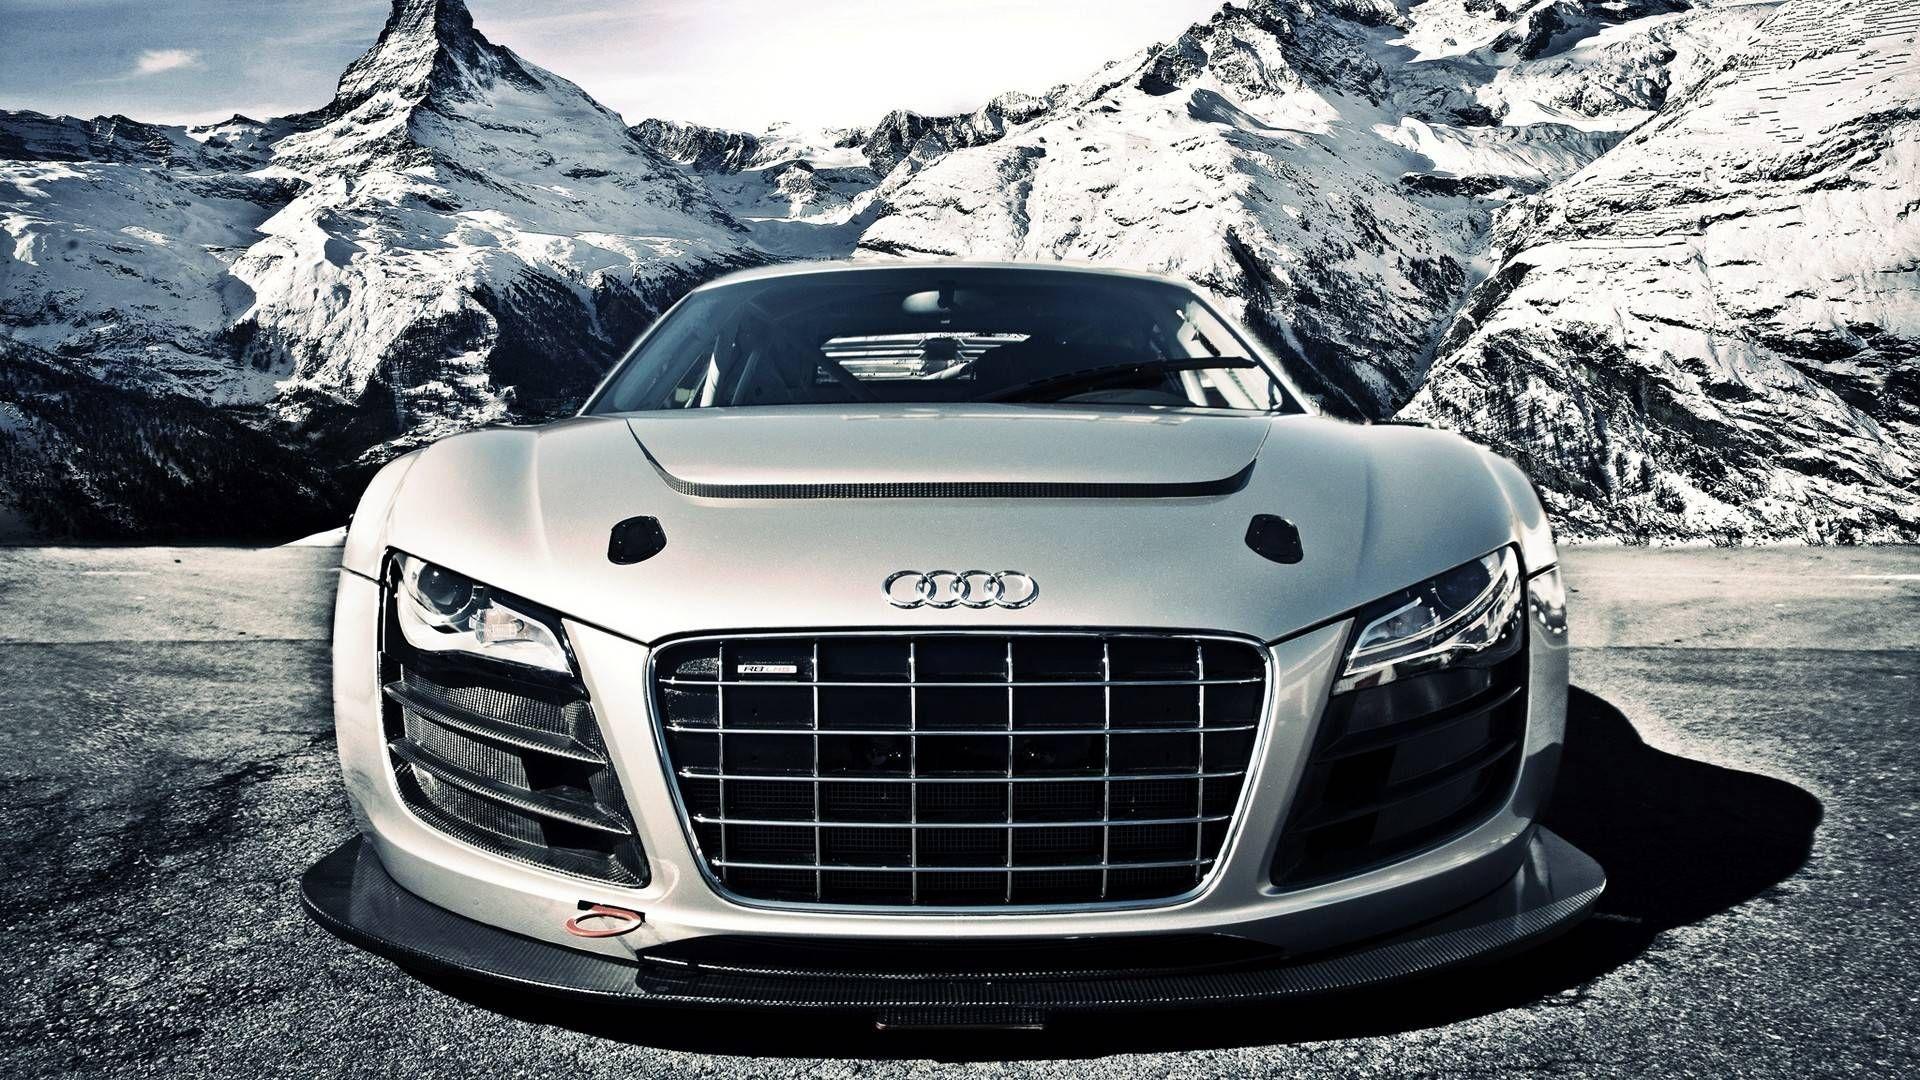 Audi R8 Gtr Audi Cars Audi R8 Audi